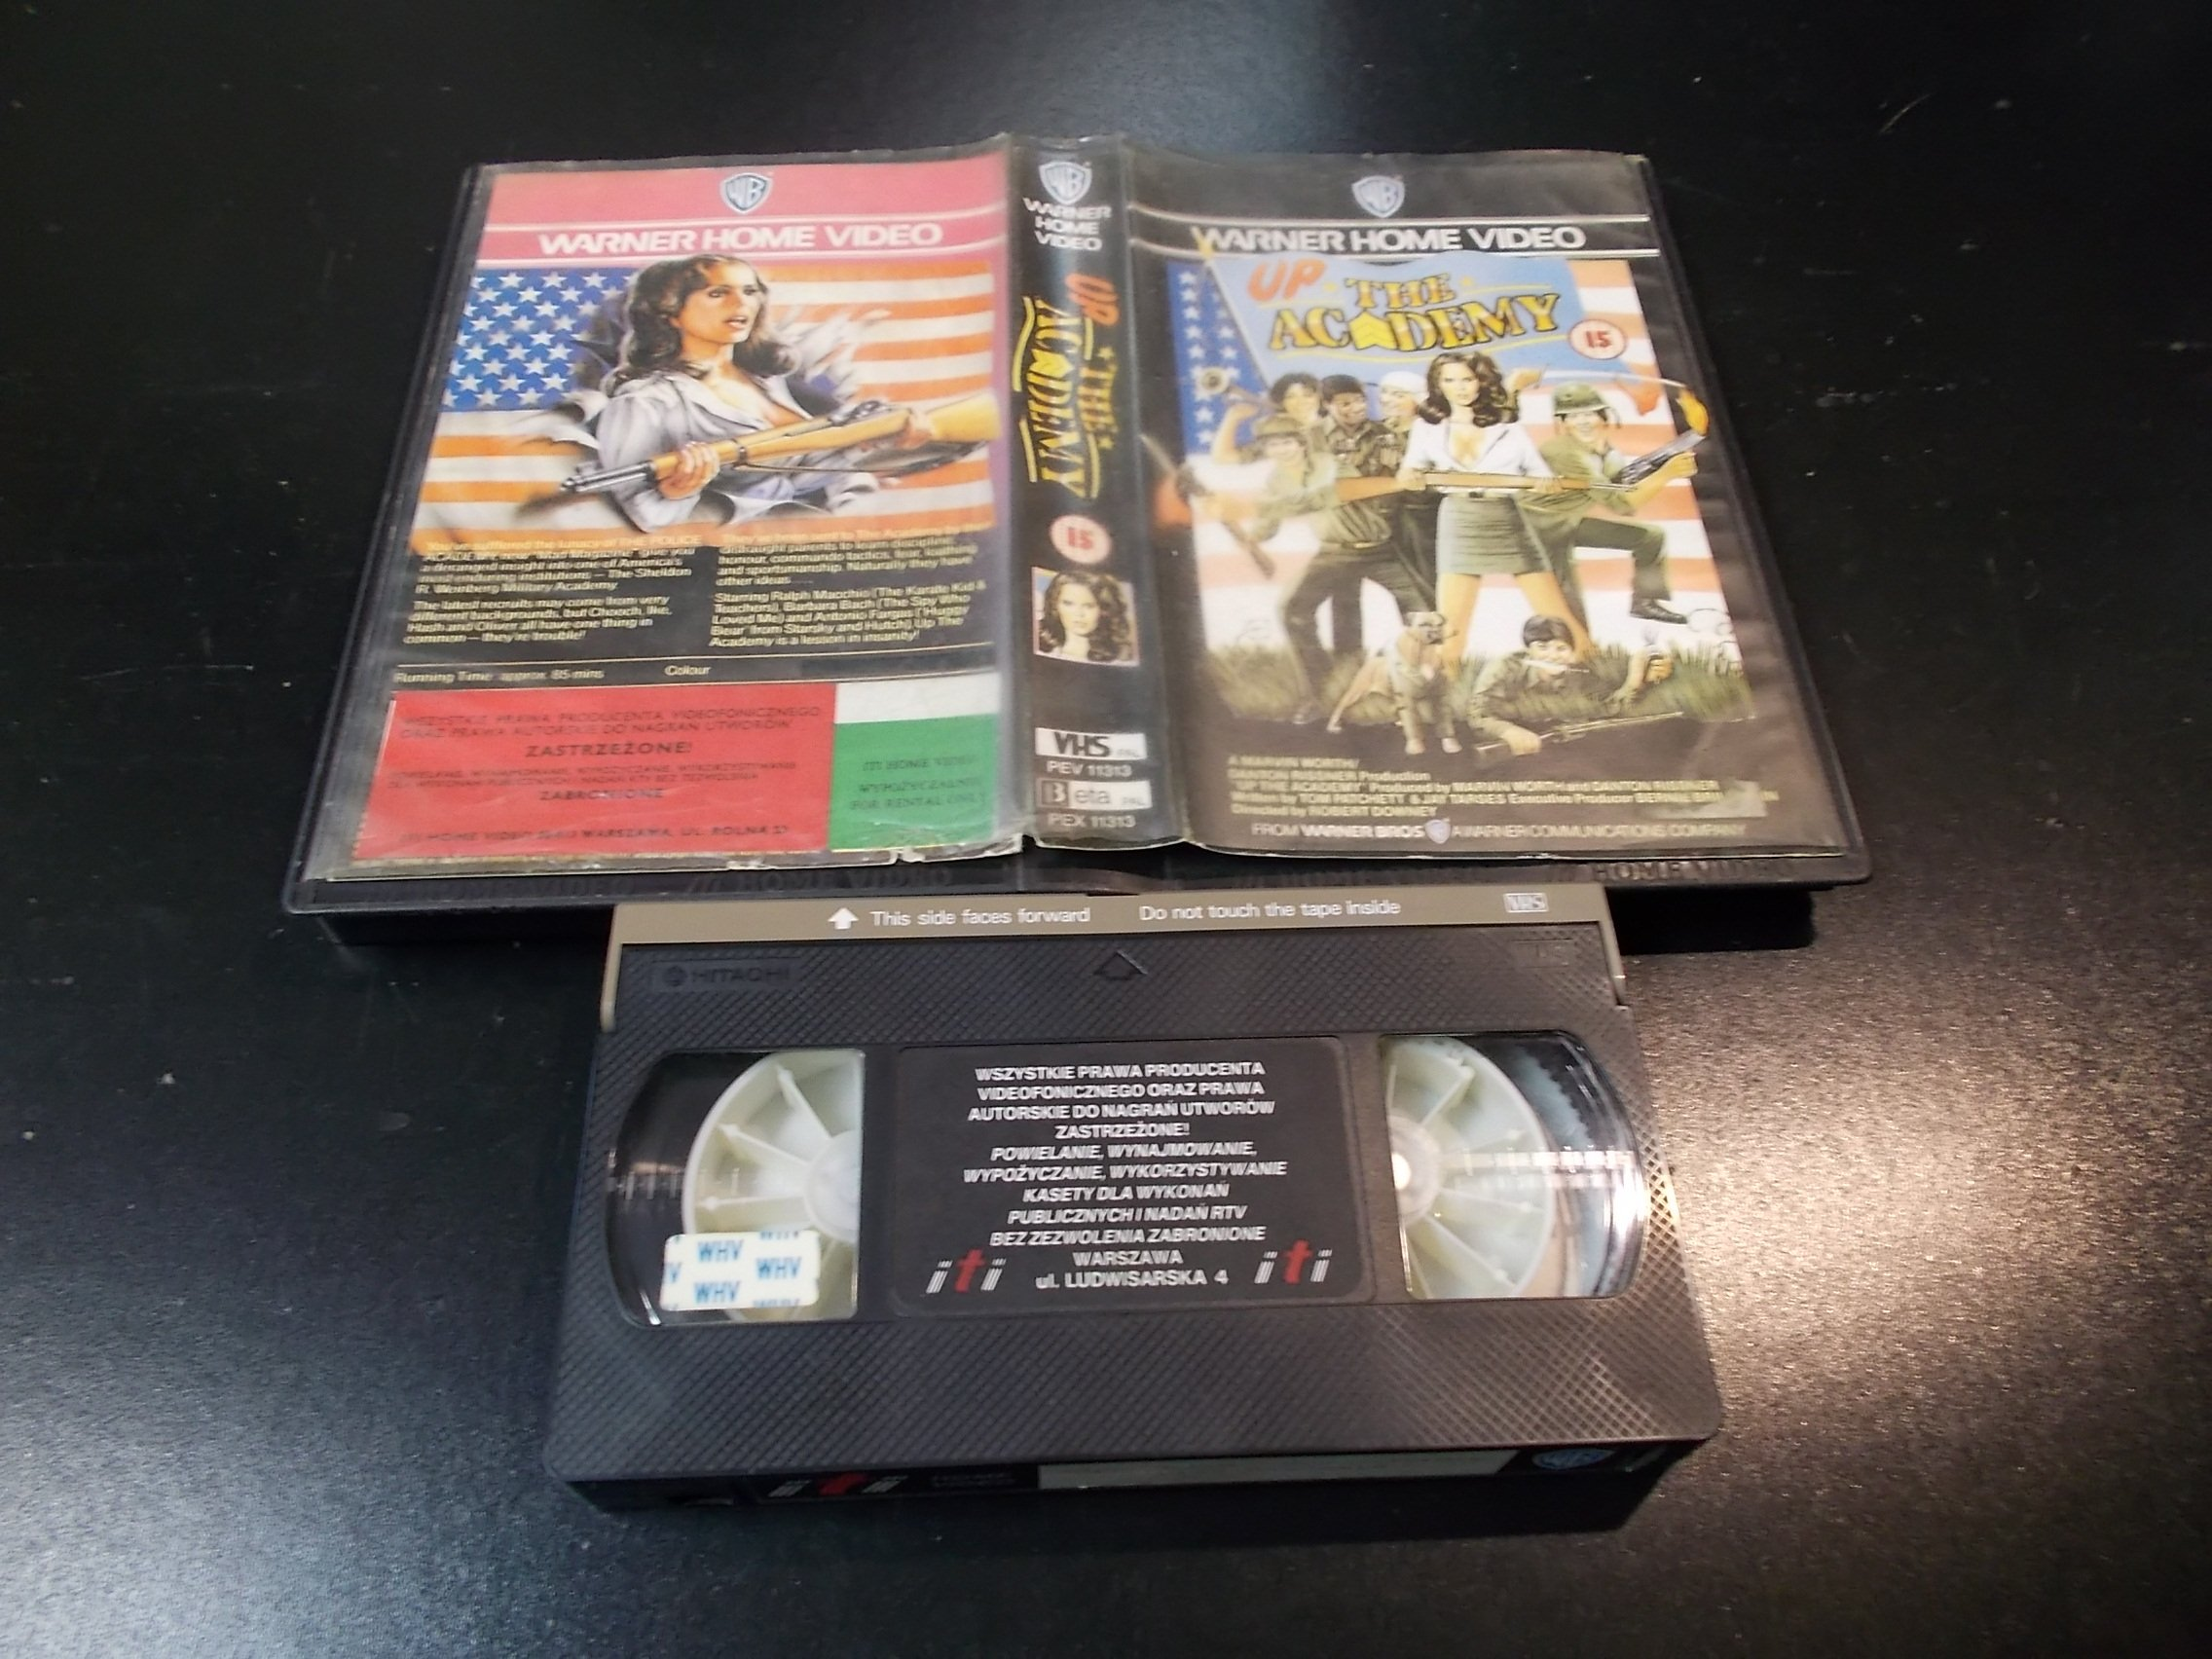 VIVA AKADEMIA - kaseta Video VHS - 1373 Sklep